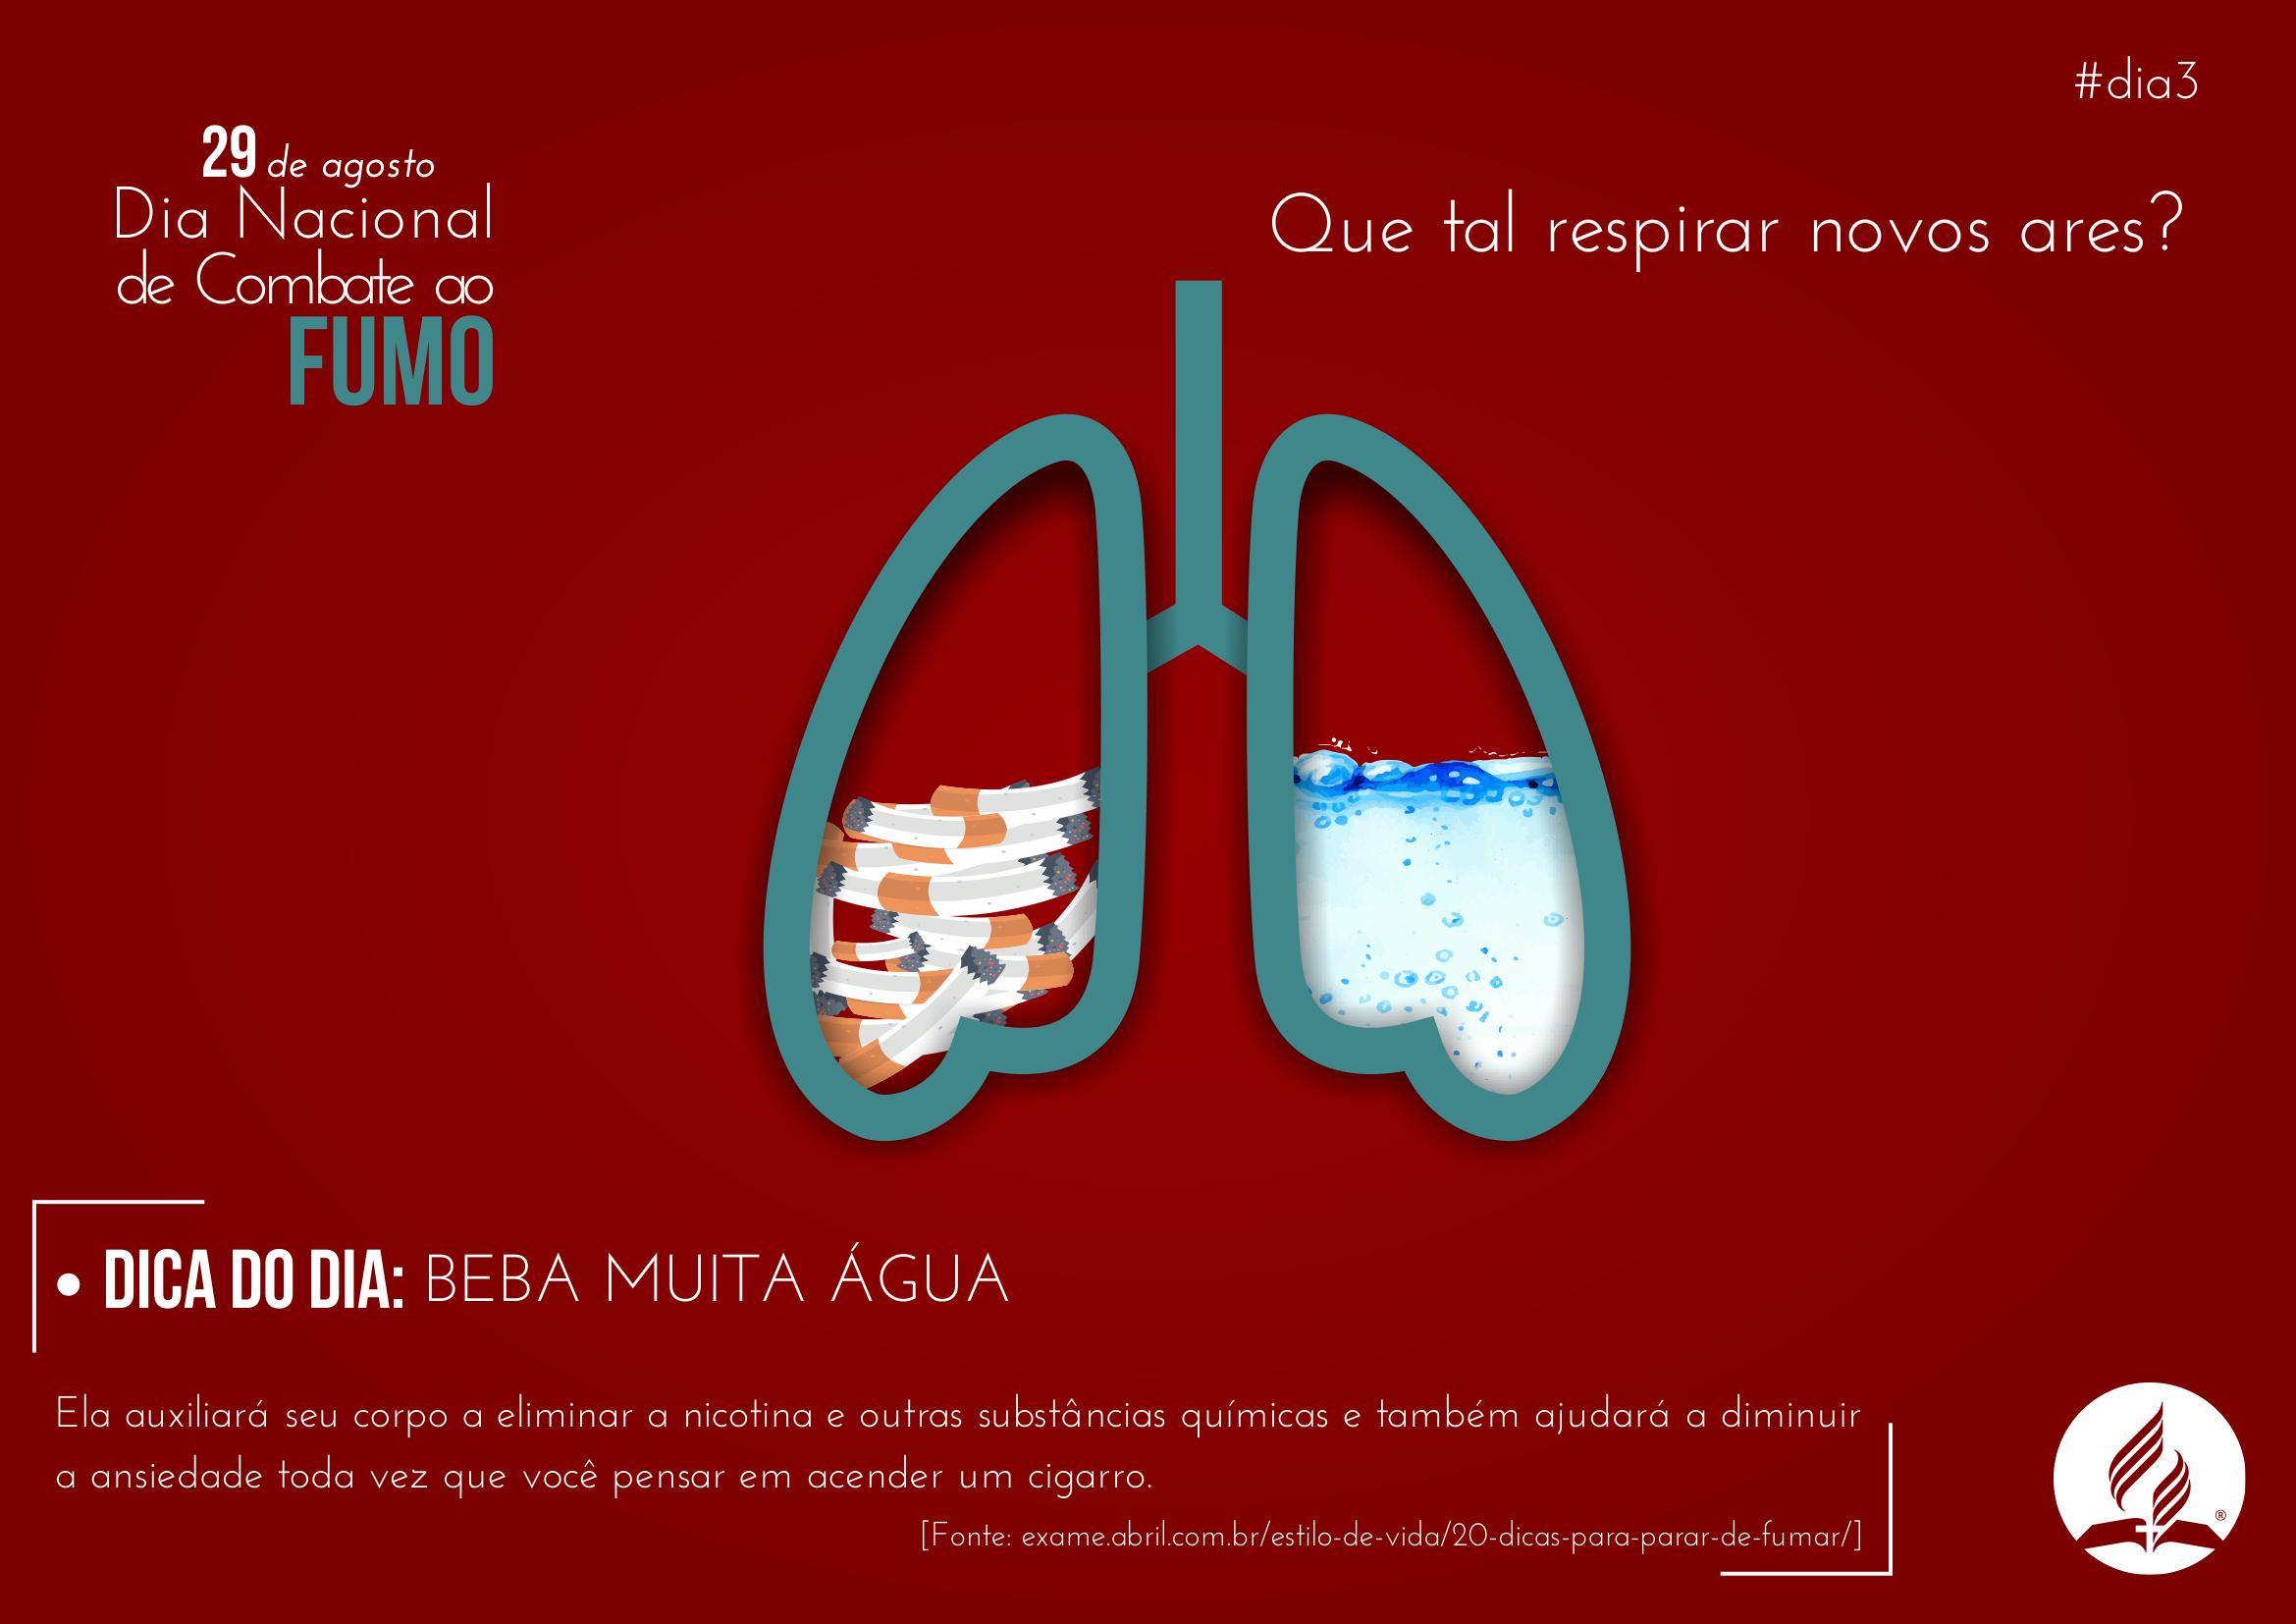 dica-3-parar-de-fumar